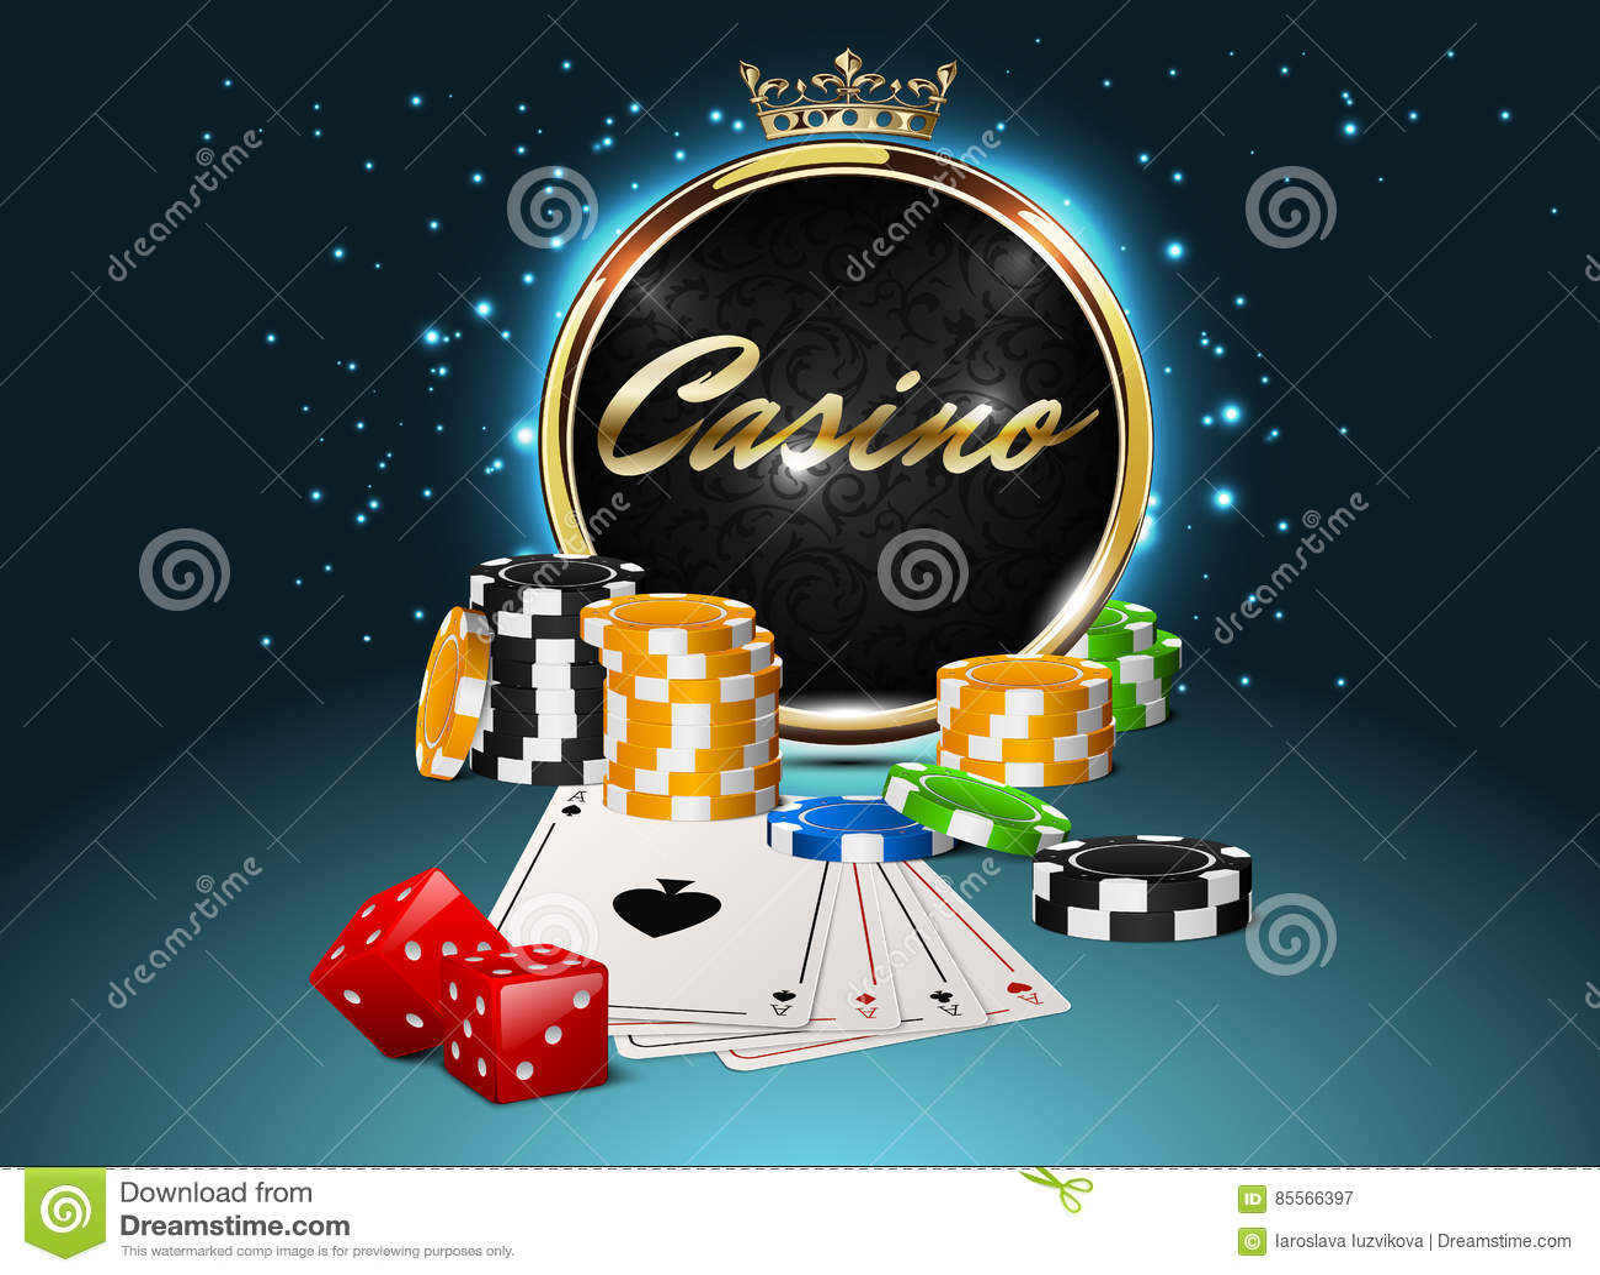 casino 888 bonusbedingungen